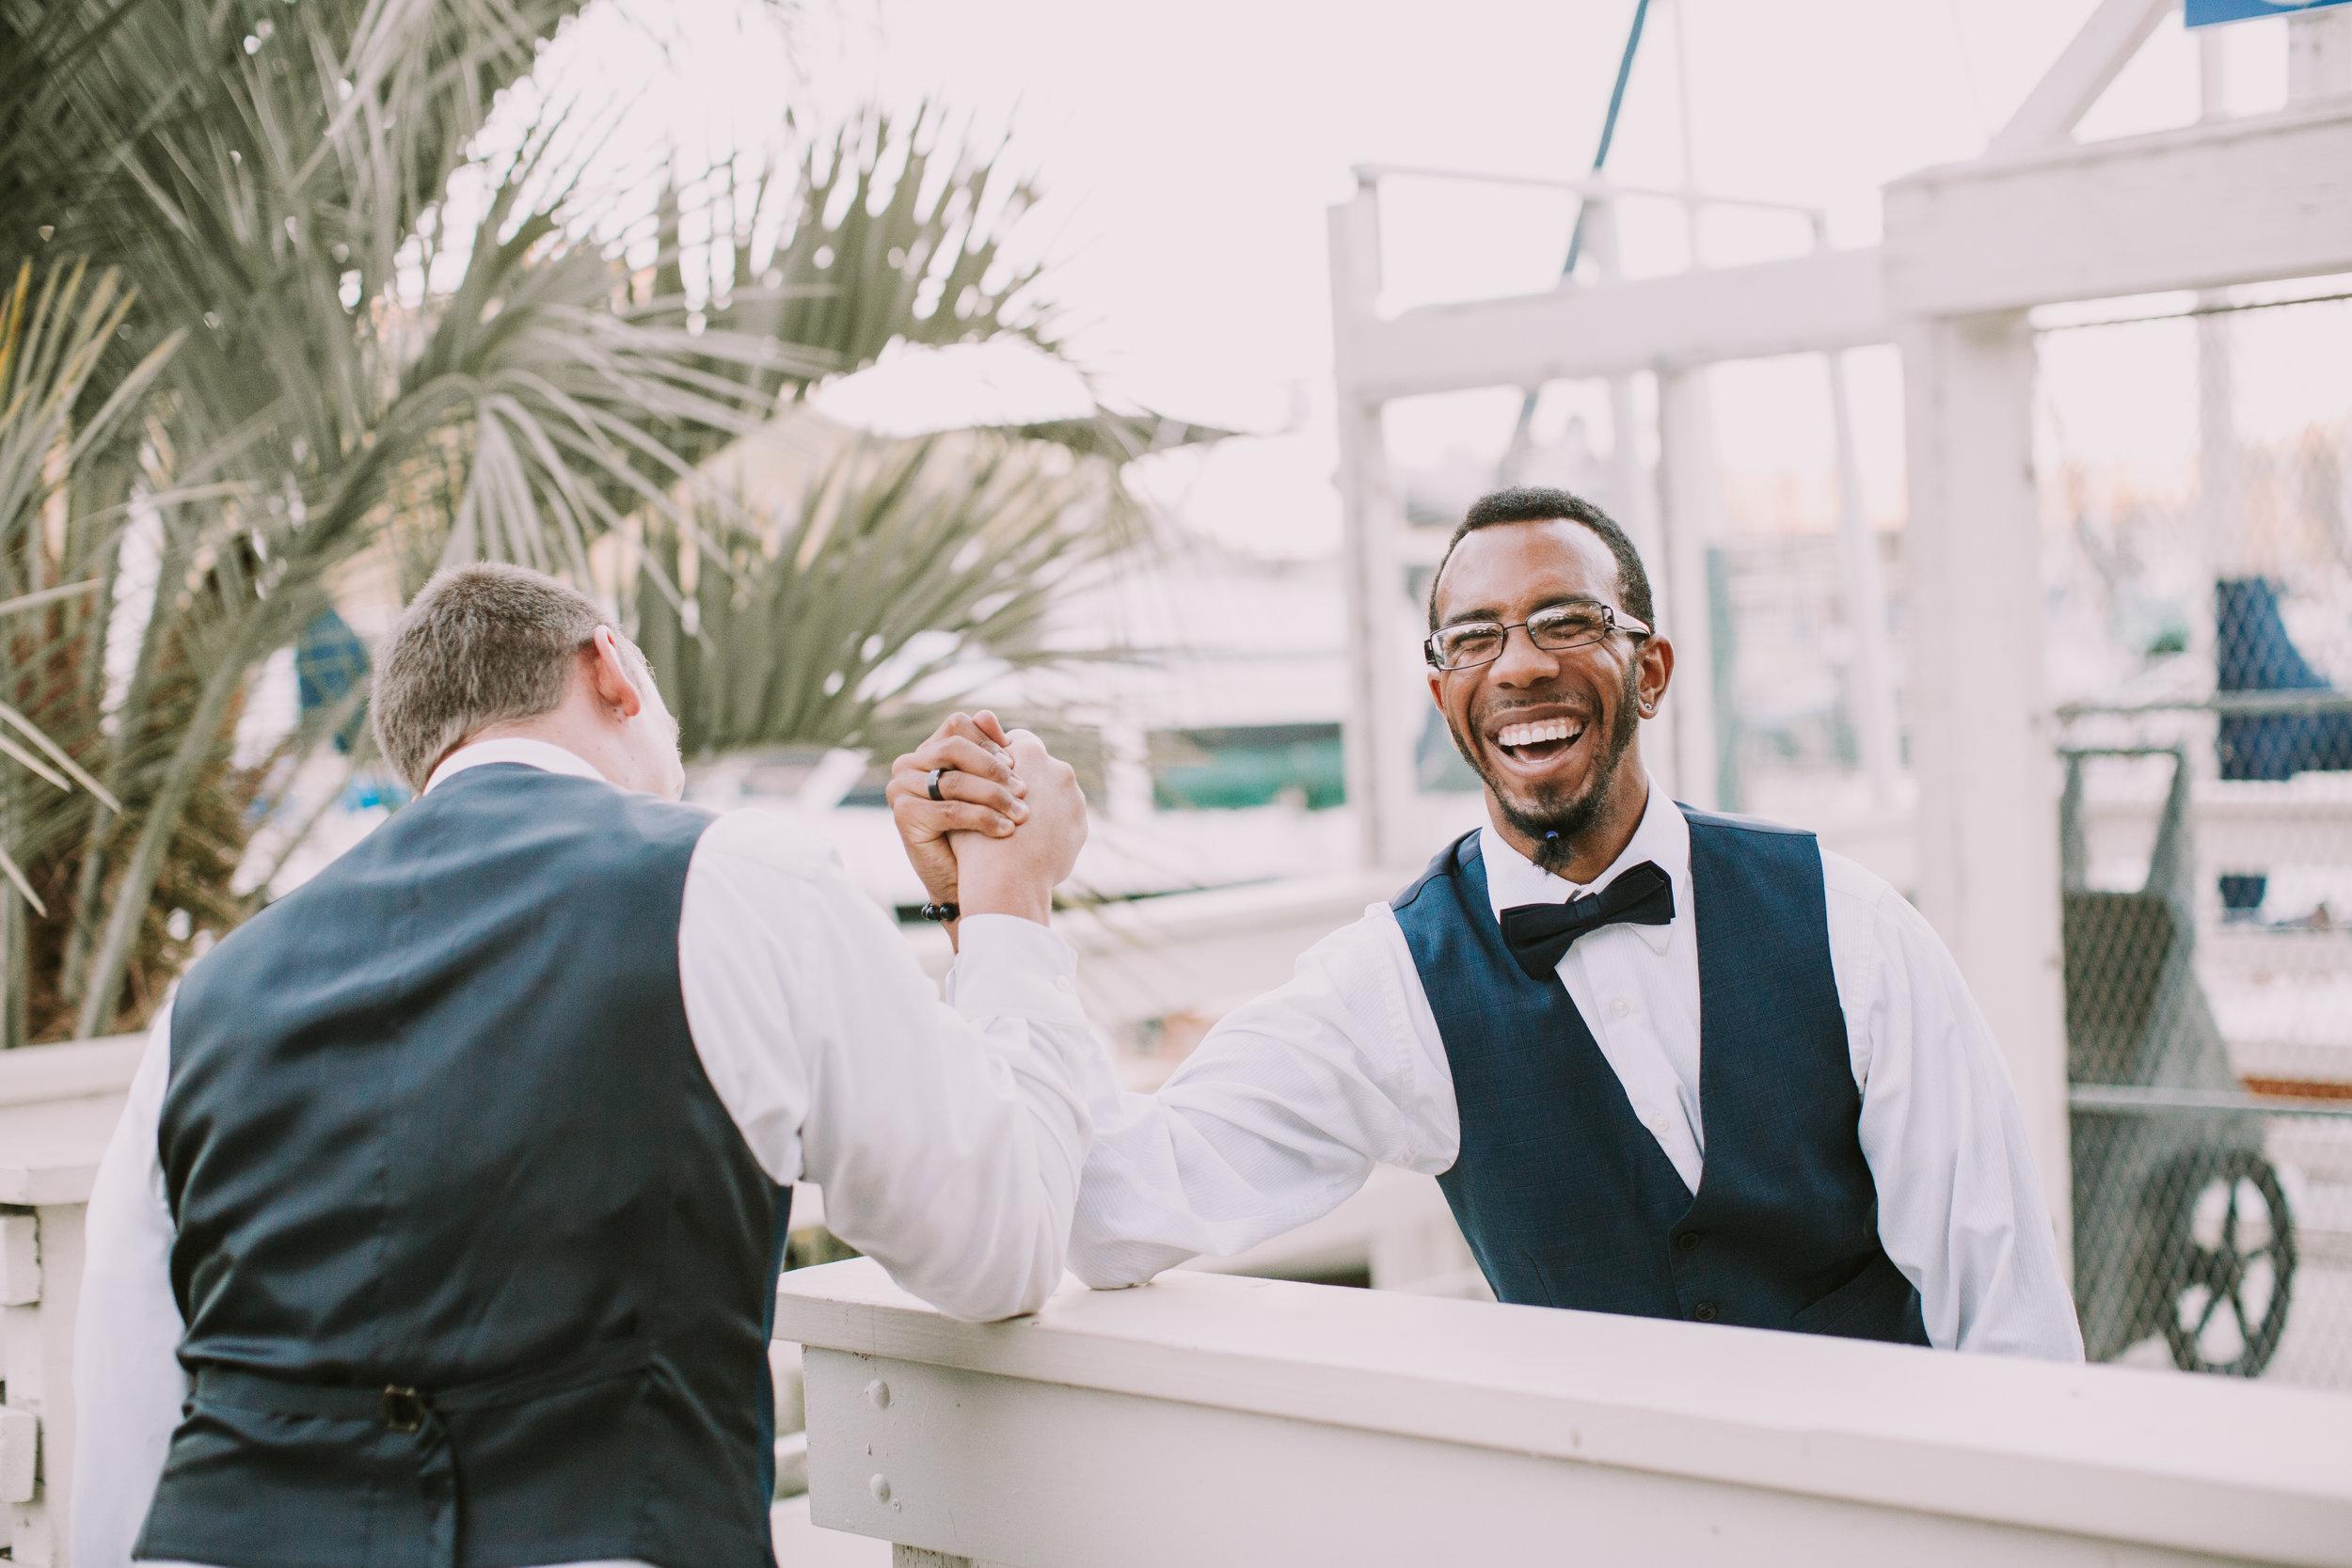 RYDER WEDDING-RYDER WEDDING 2-0110.jpg